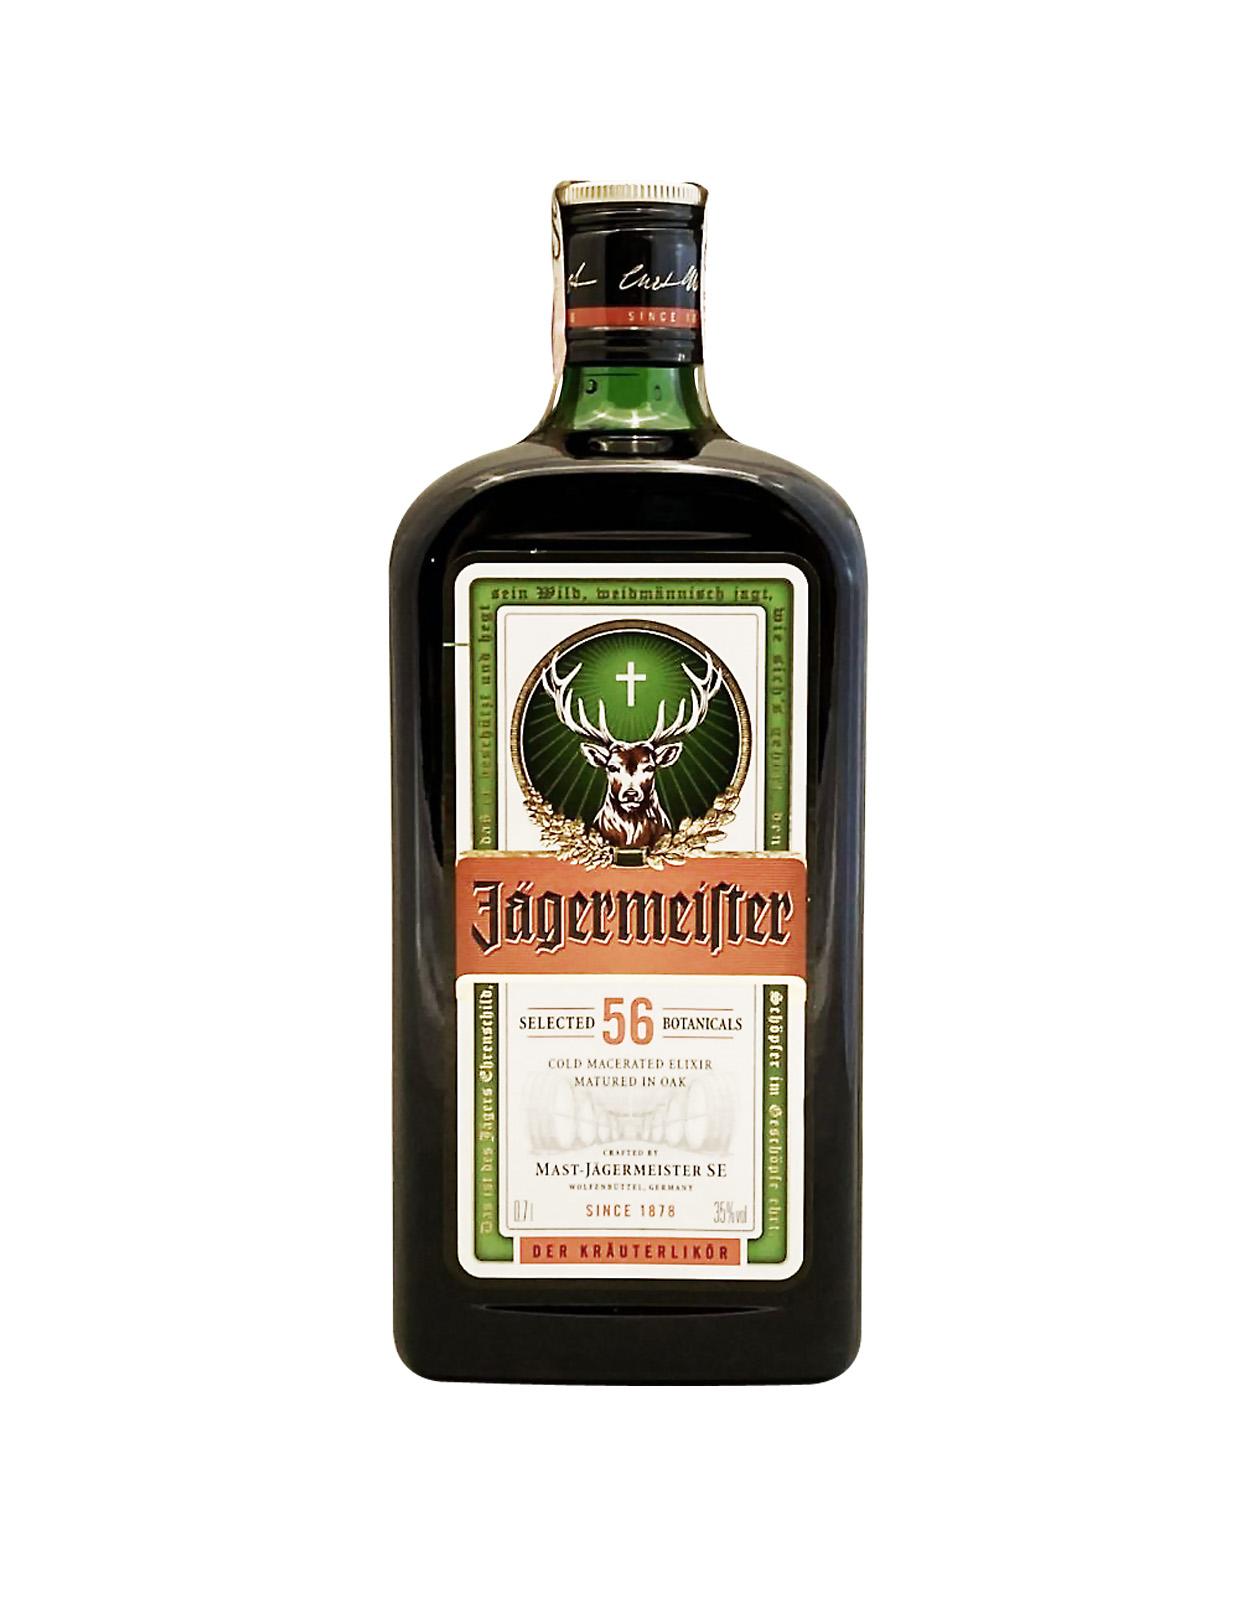 Jägermaister 35%, Bottleshop Sunny wines slnecnice mesto, petrzalka, likér, rozvoz alkoholu, eshop